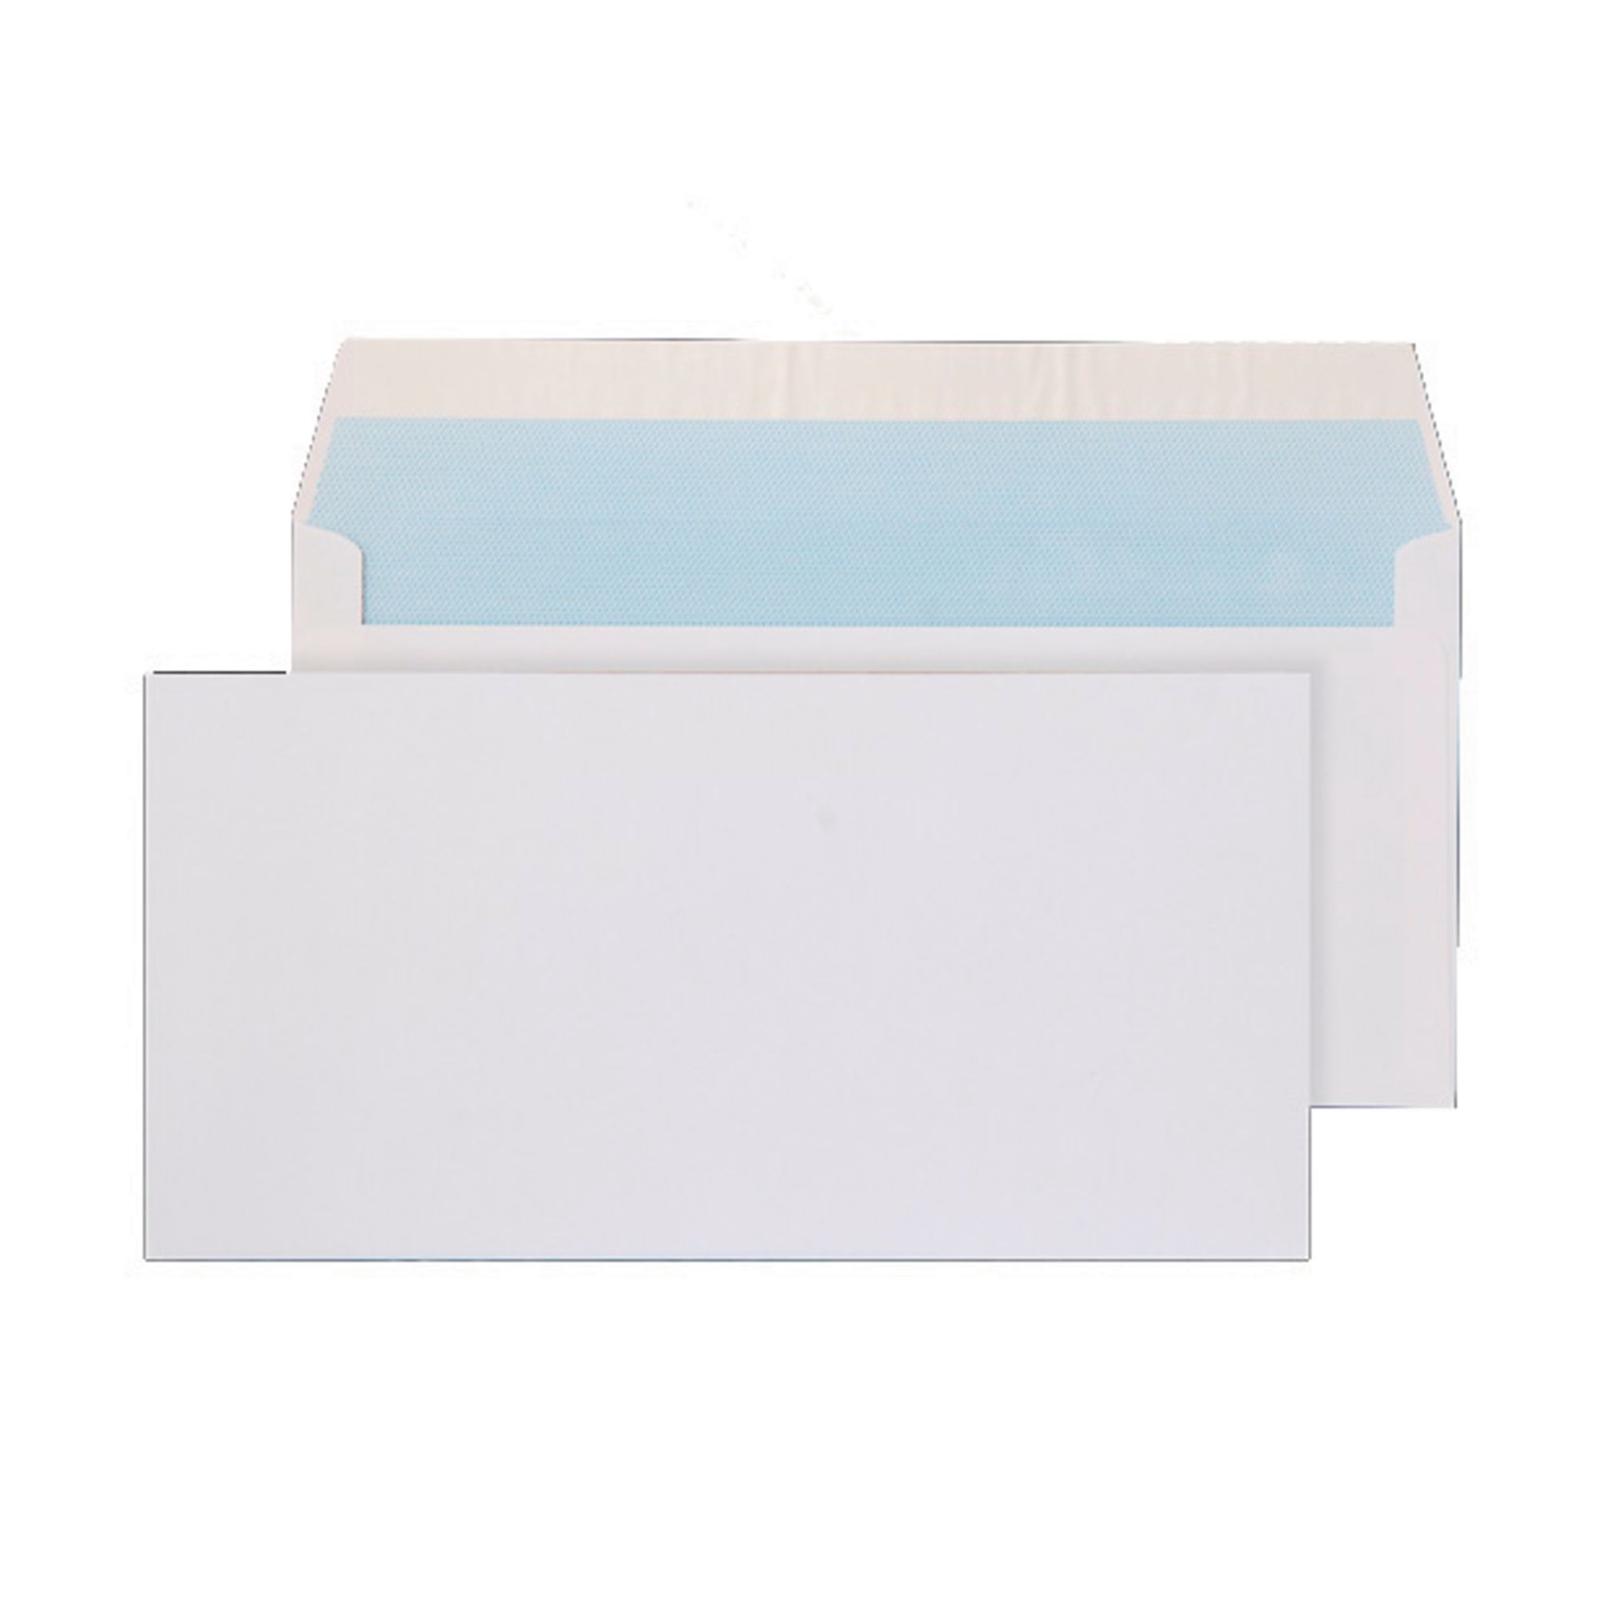 DL White Peel and Seal Pocket Envelopes - Box of 500